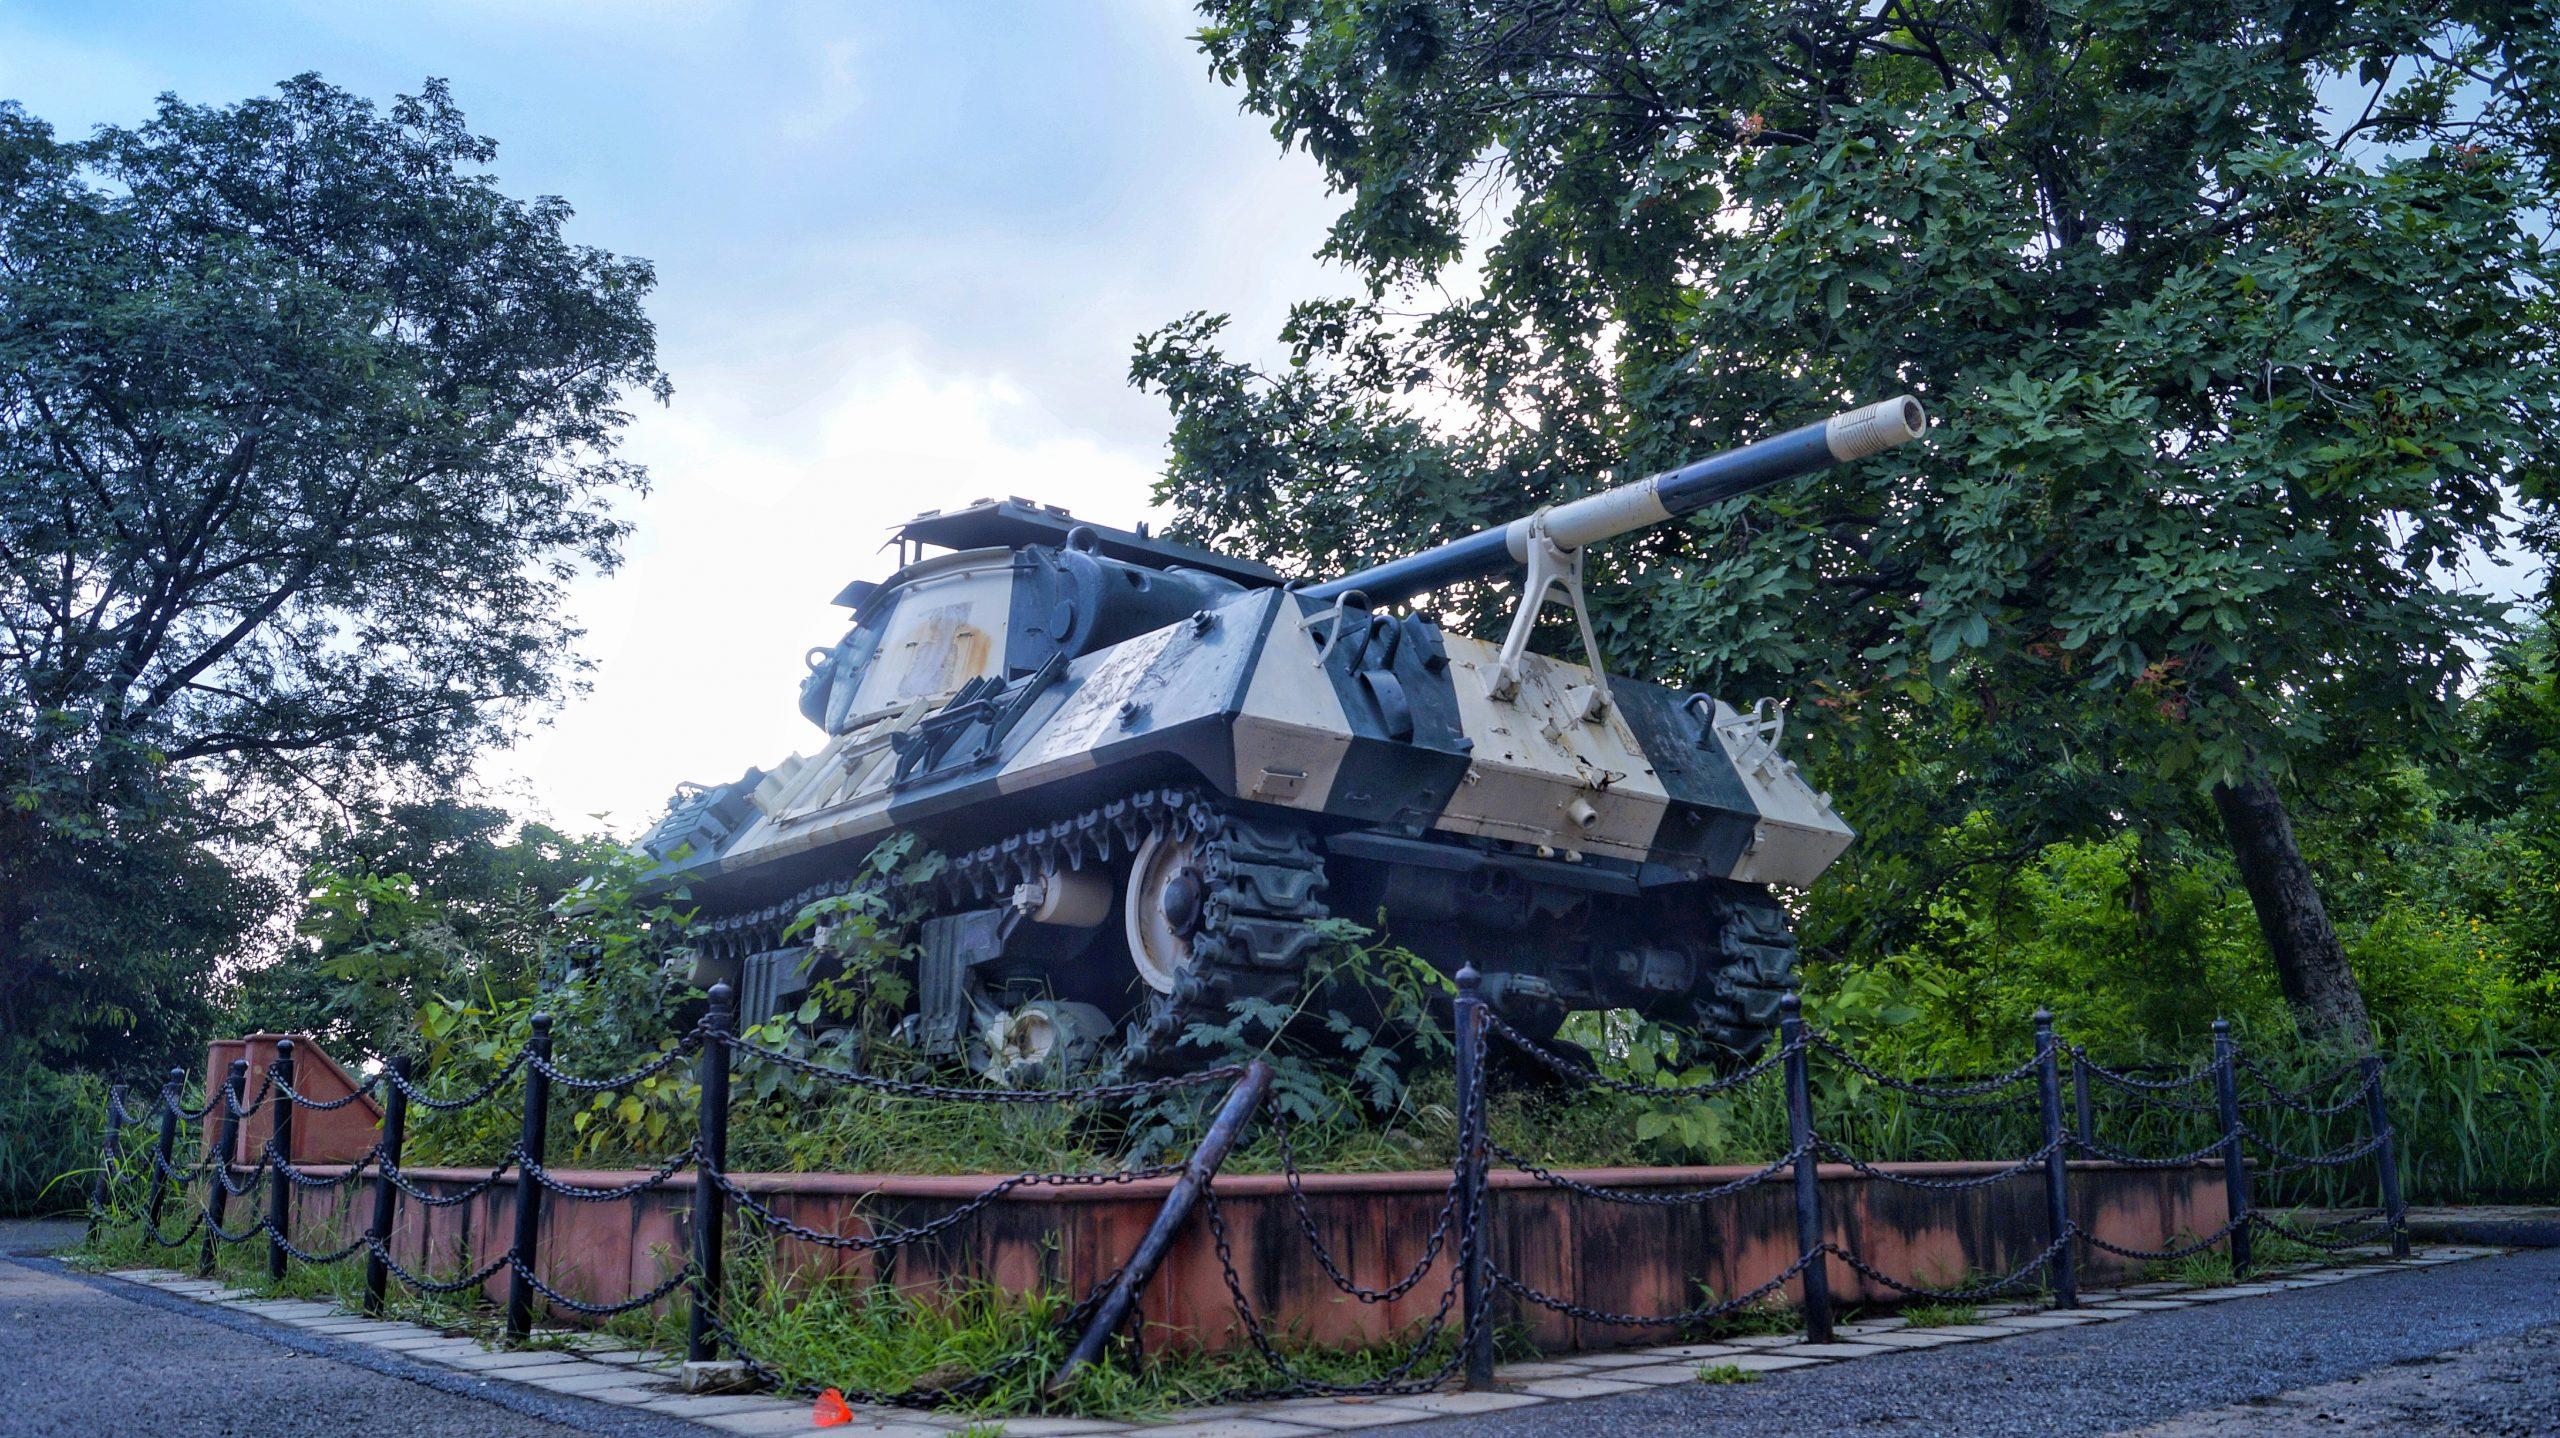 An army tank